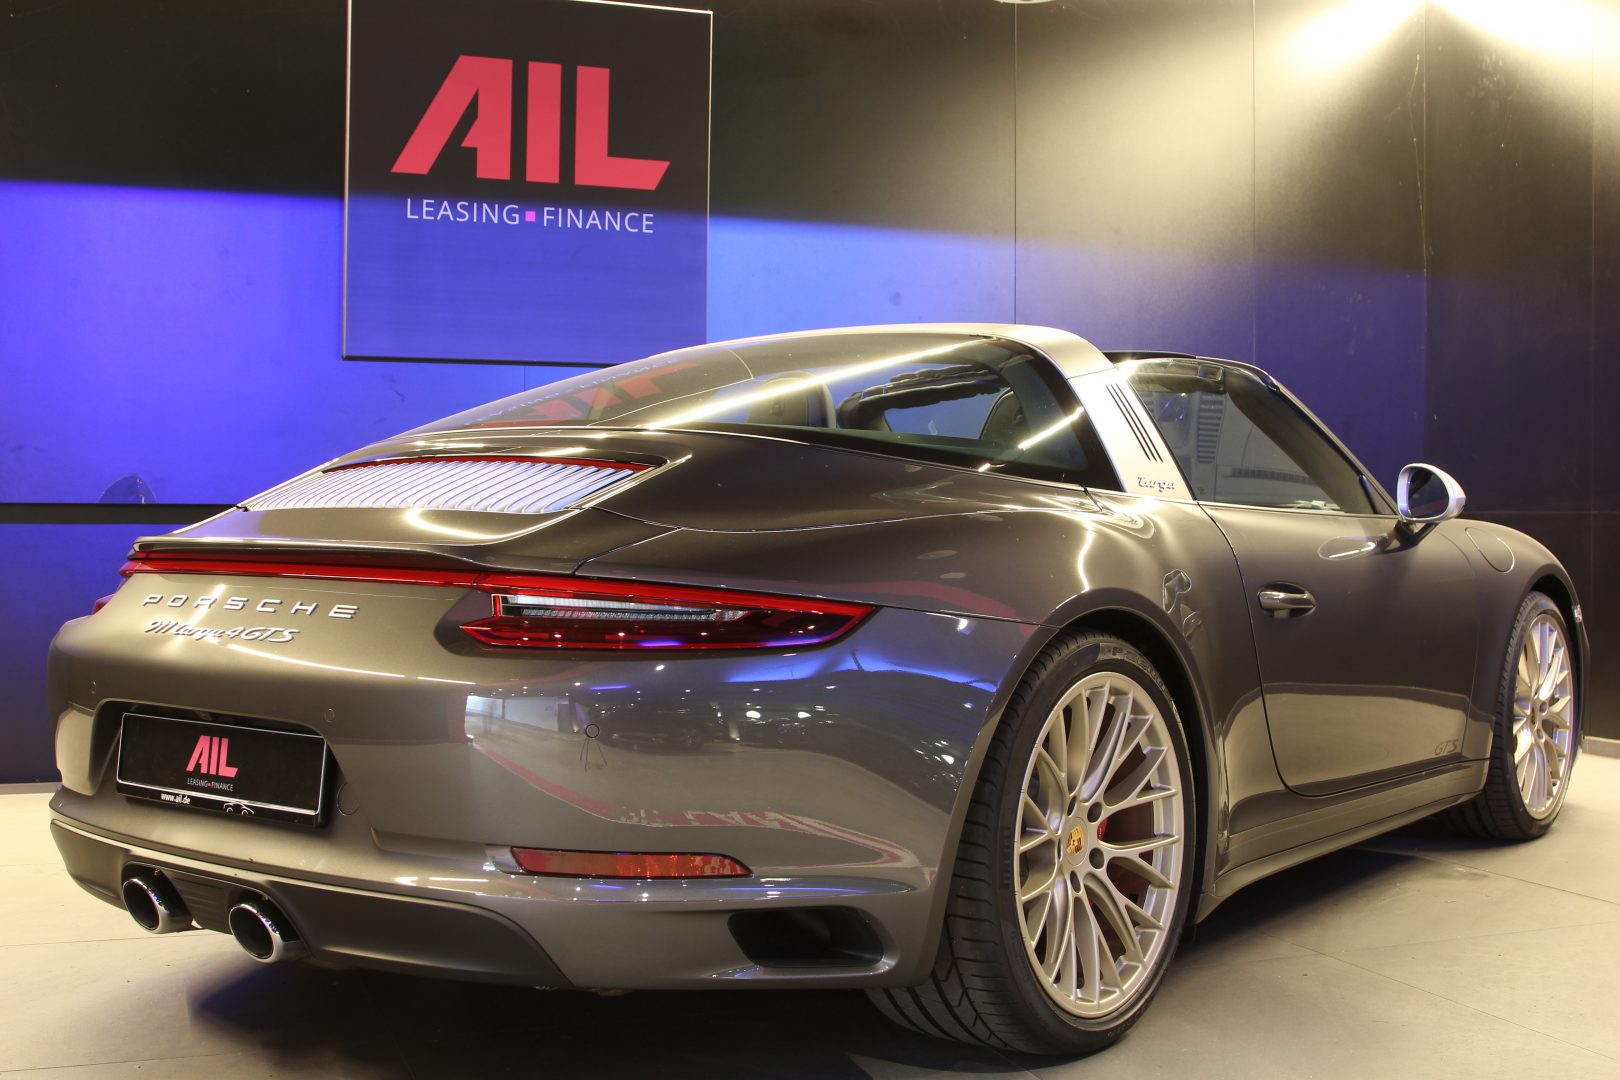 AIL Porsche 991 Targa 4 GTS Exclusiv 6